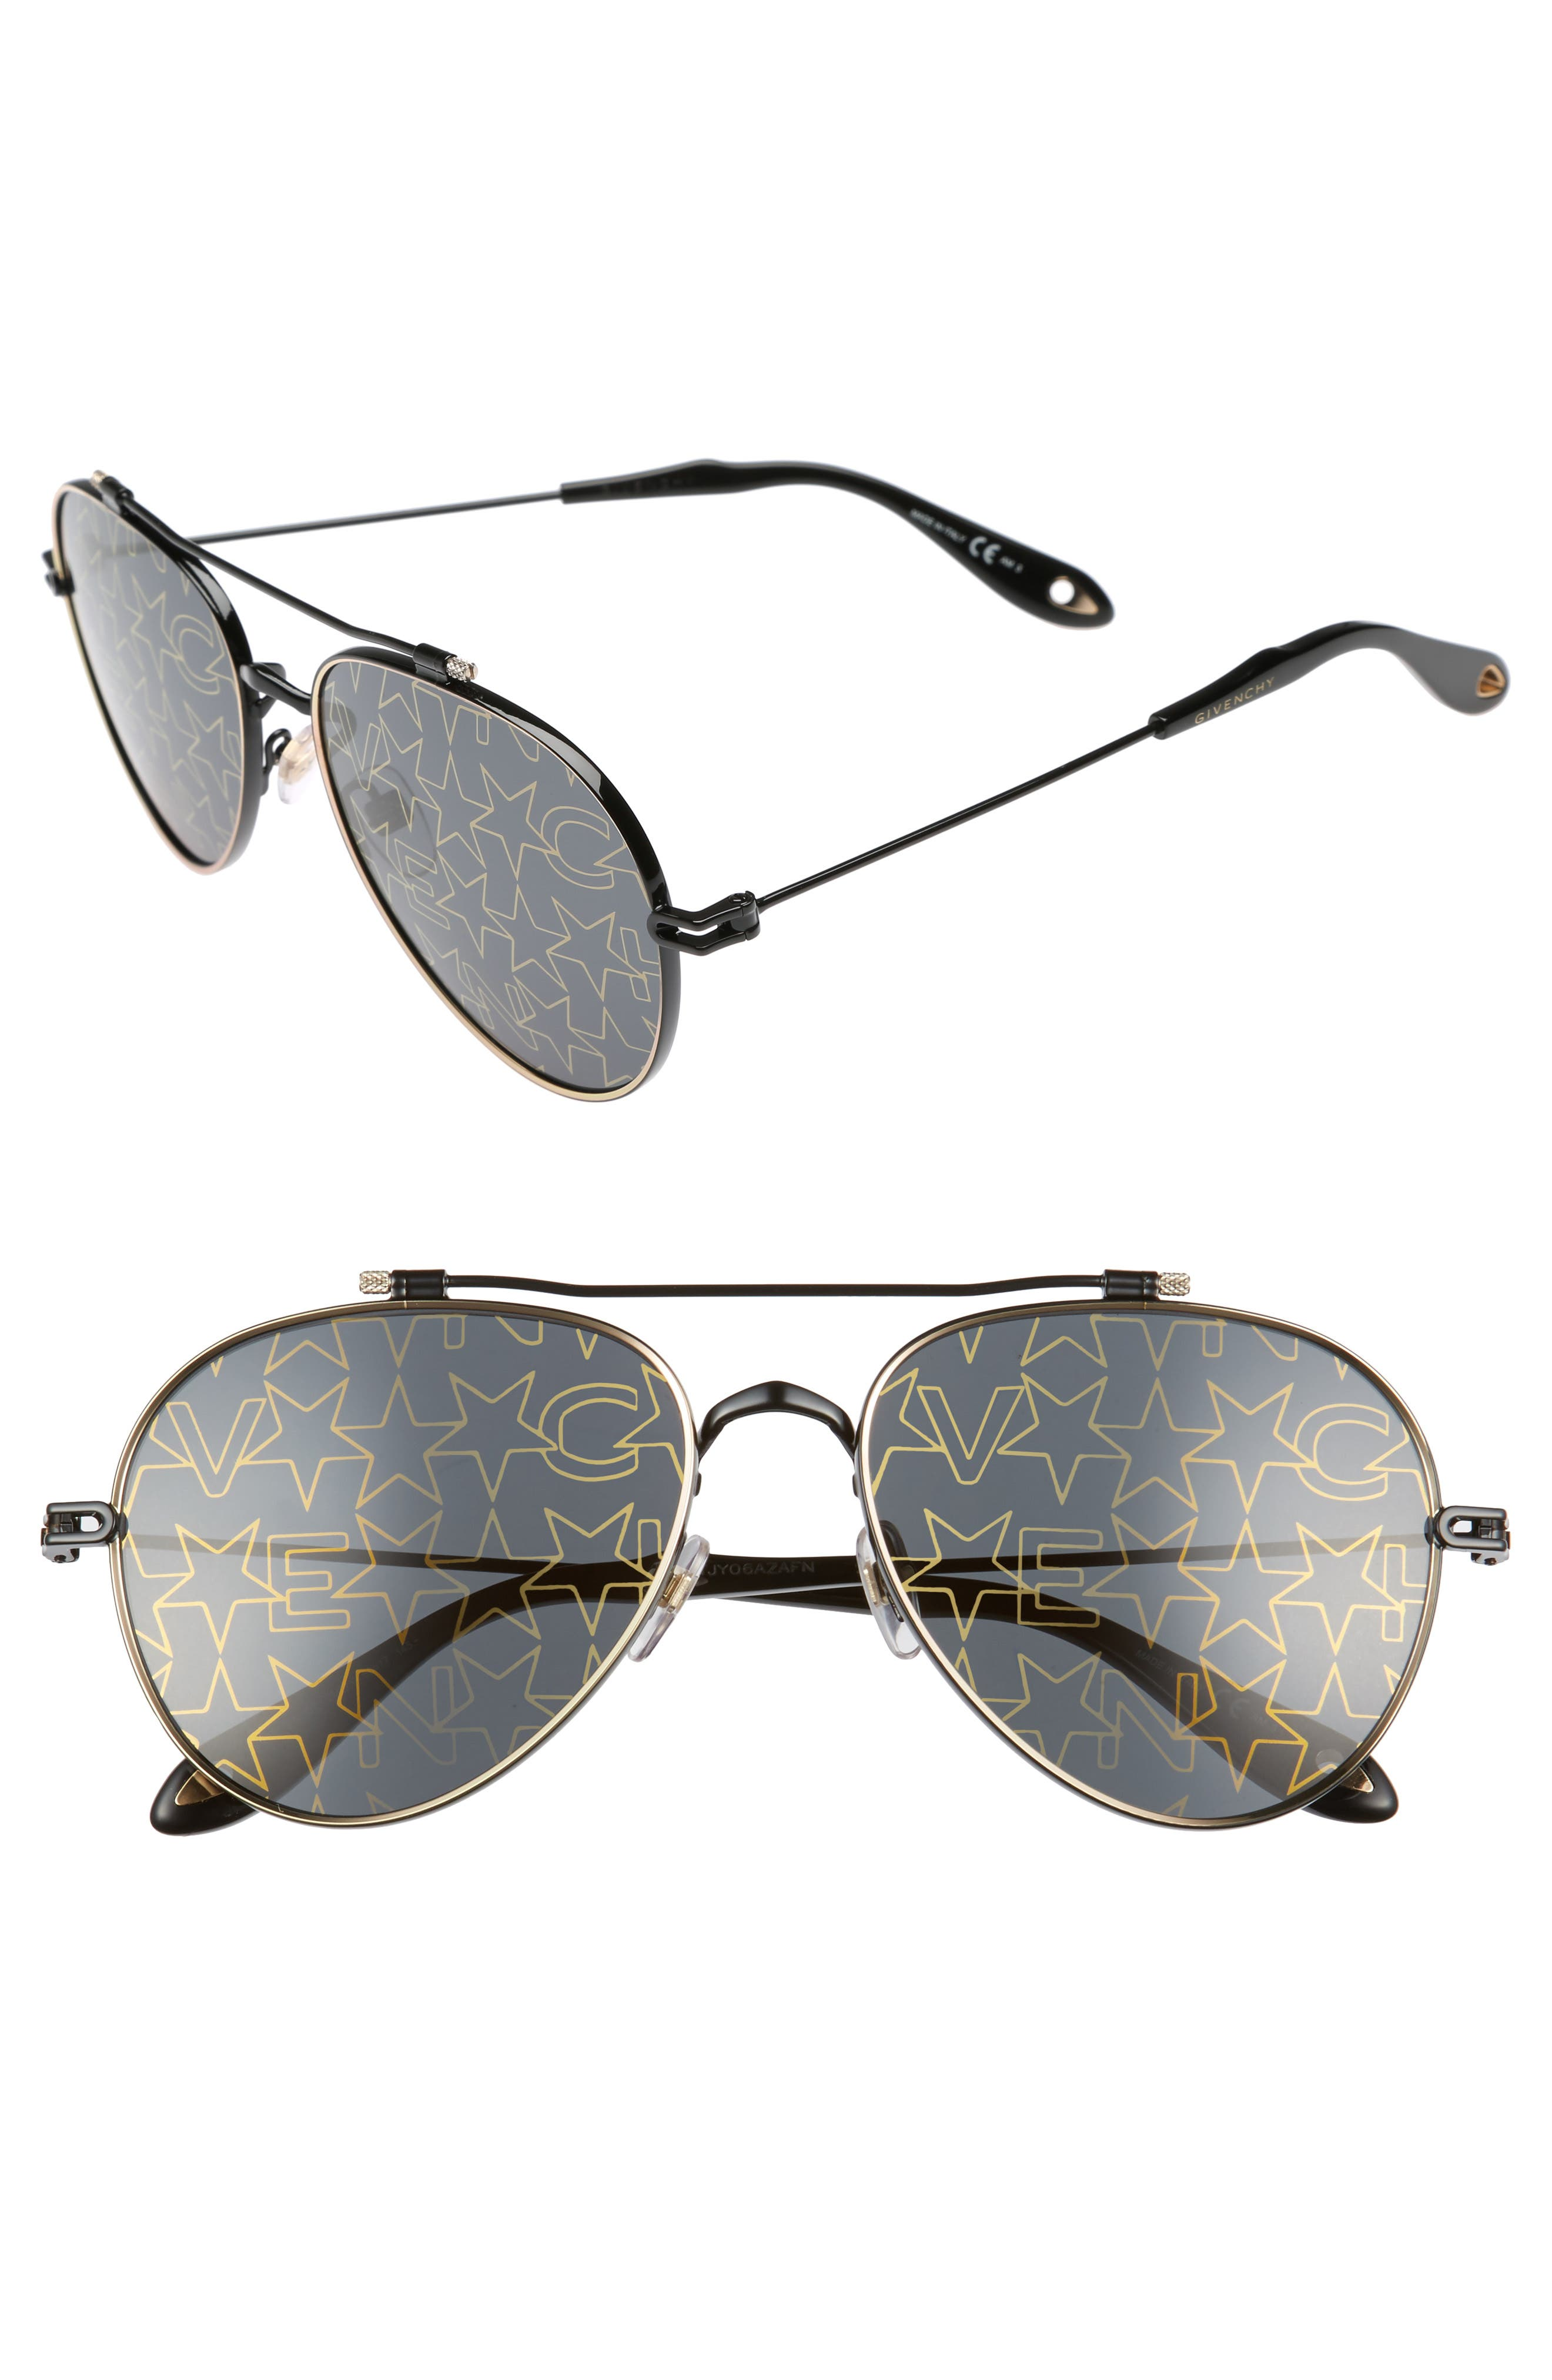 58mm Aviator Sunglasses,                         Main,                         color, 001